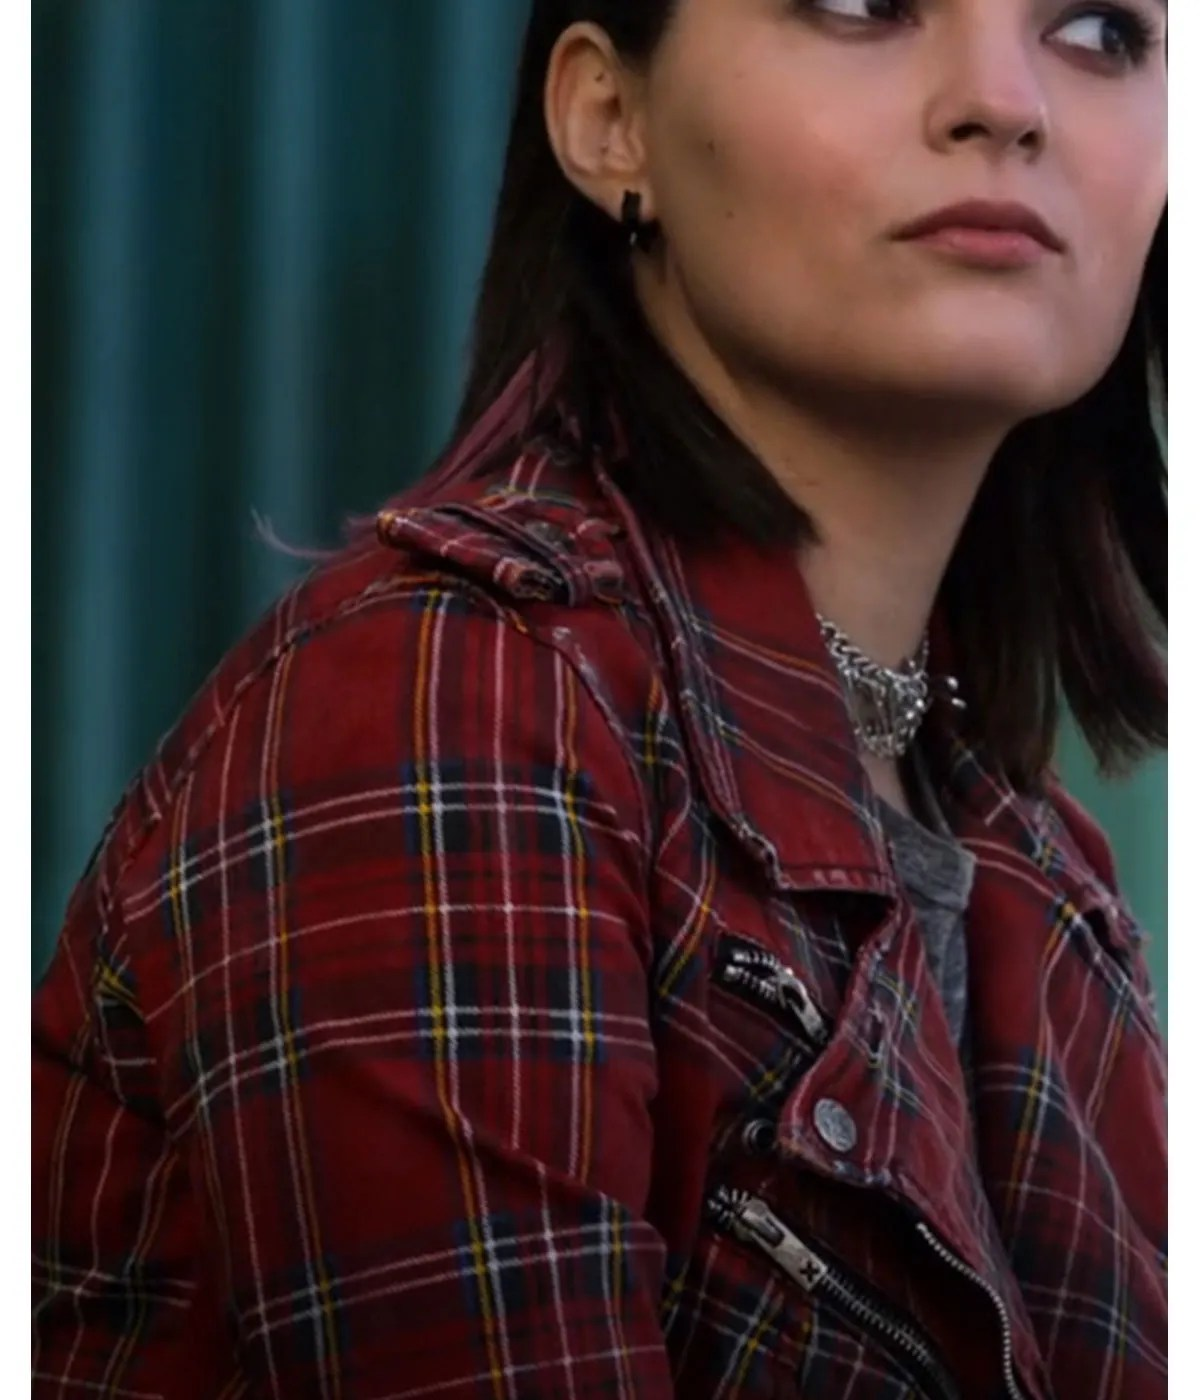 lucifer-plaid-brianna-red-jacket